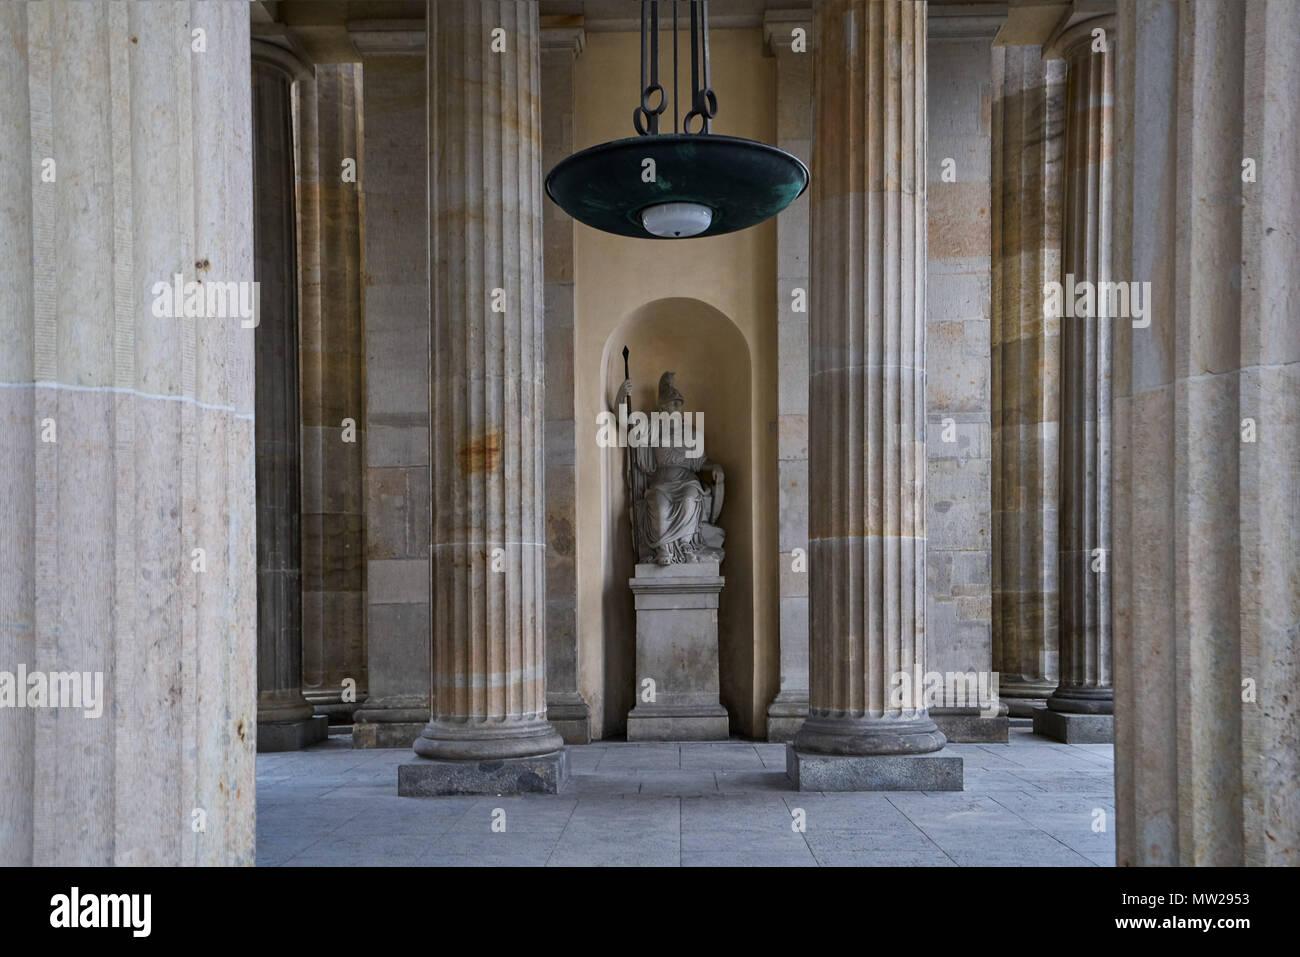 Berlin, Germany - April 2, 2017: Statue of Pallas Athena holding a spear inside the Brandenburg Gate or Brandenburger Tor - Stock Image